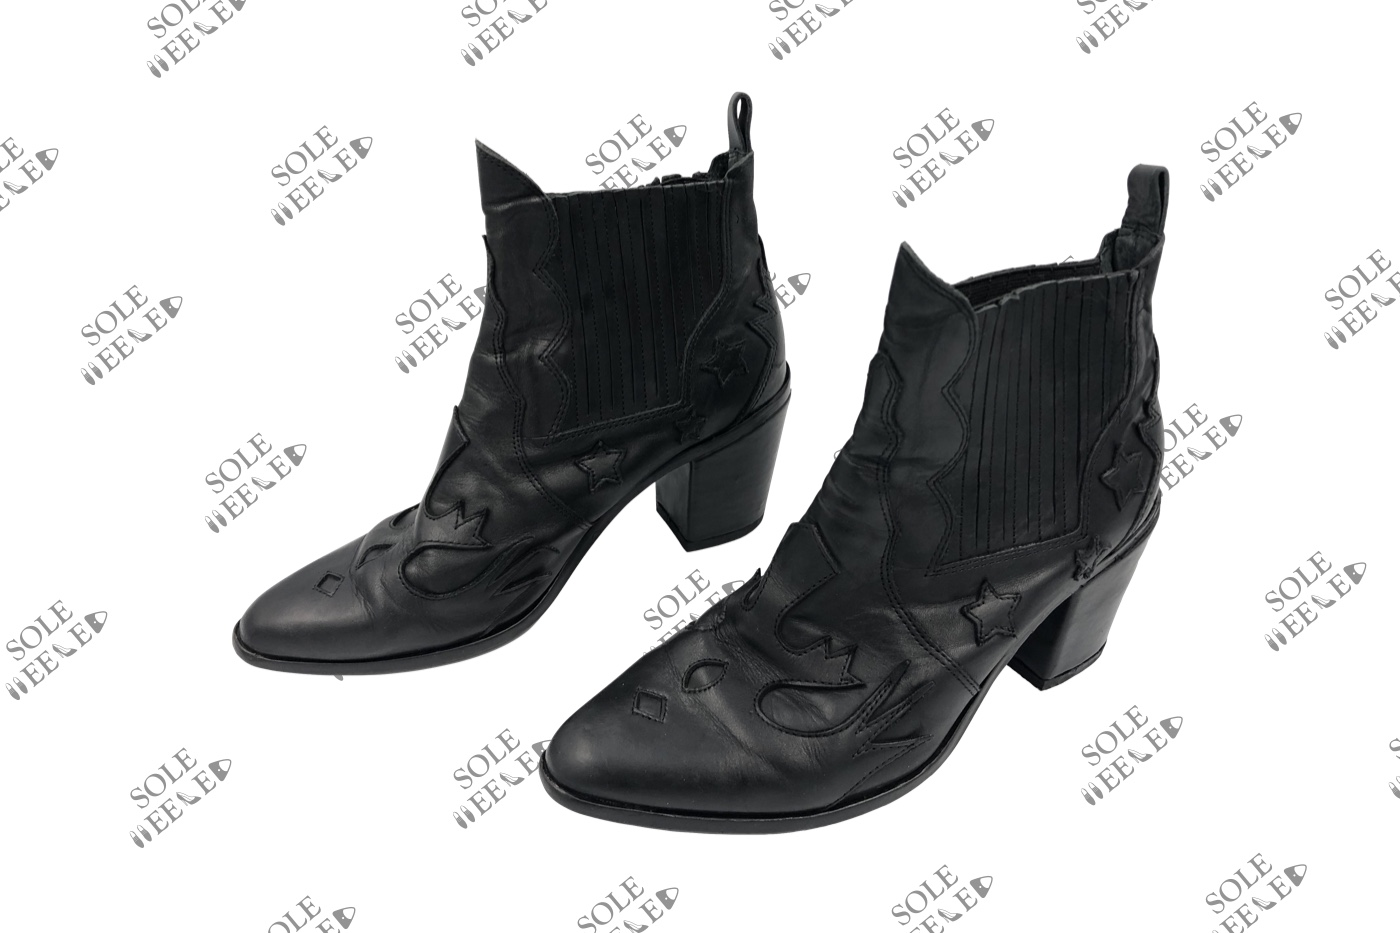 Wittner Boot Heel Repair